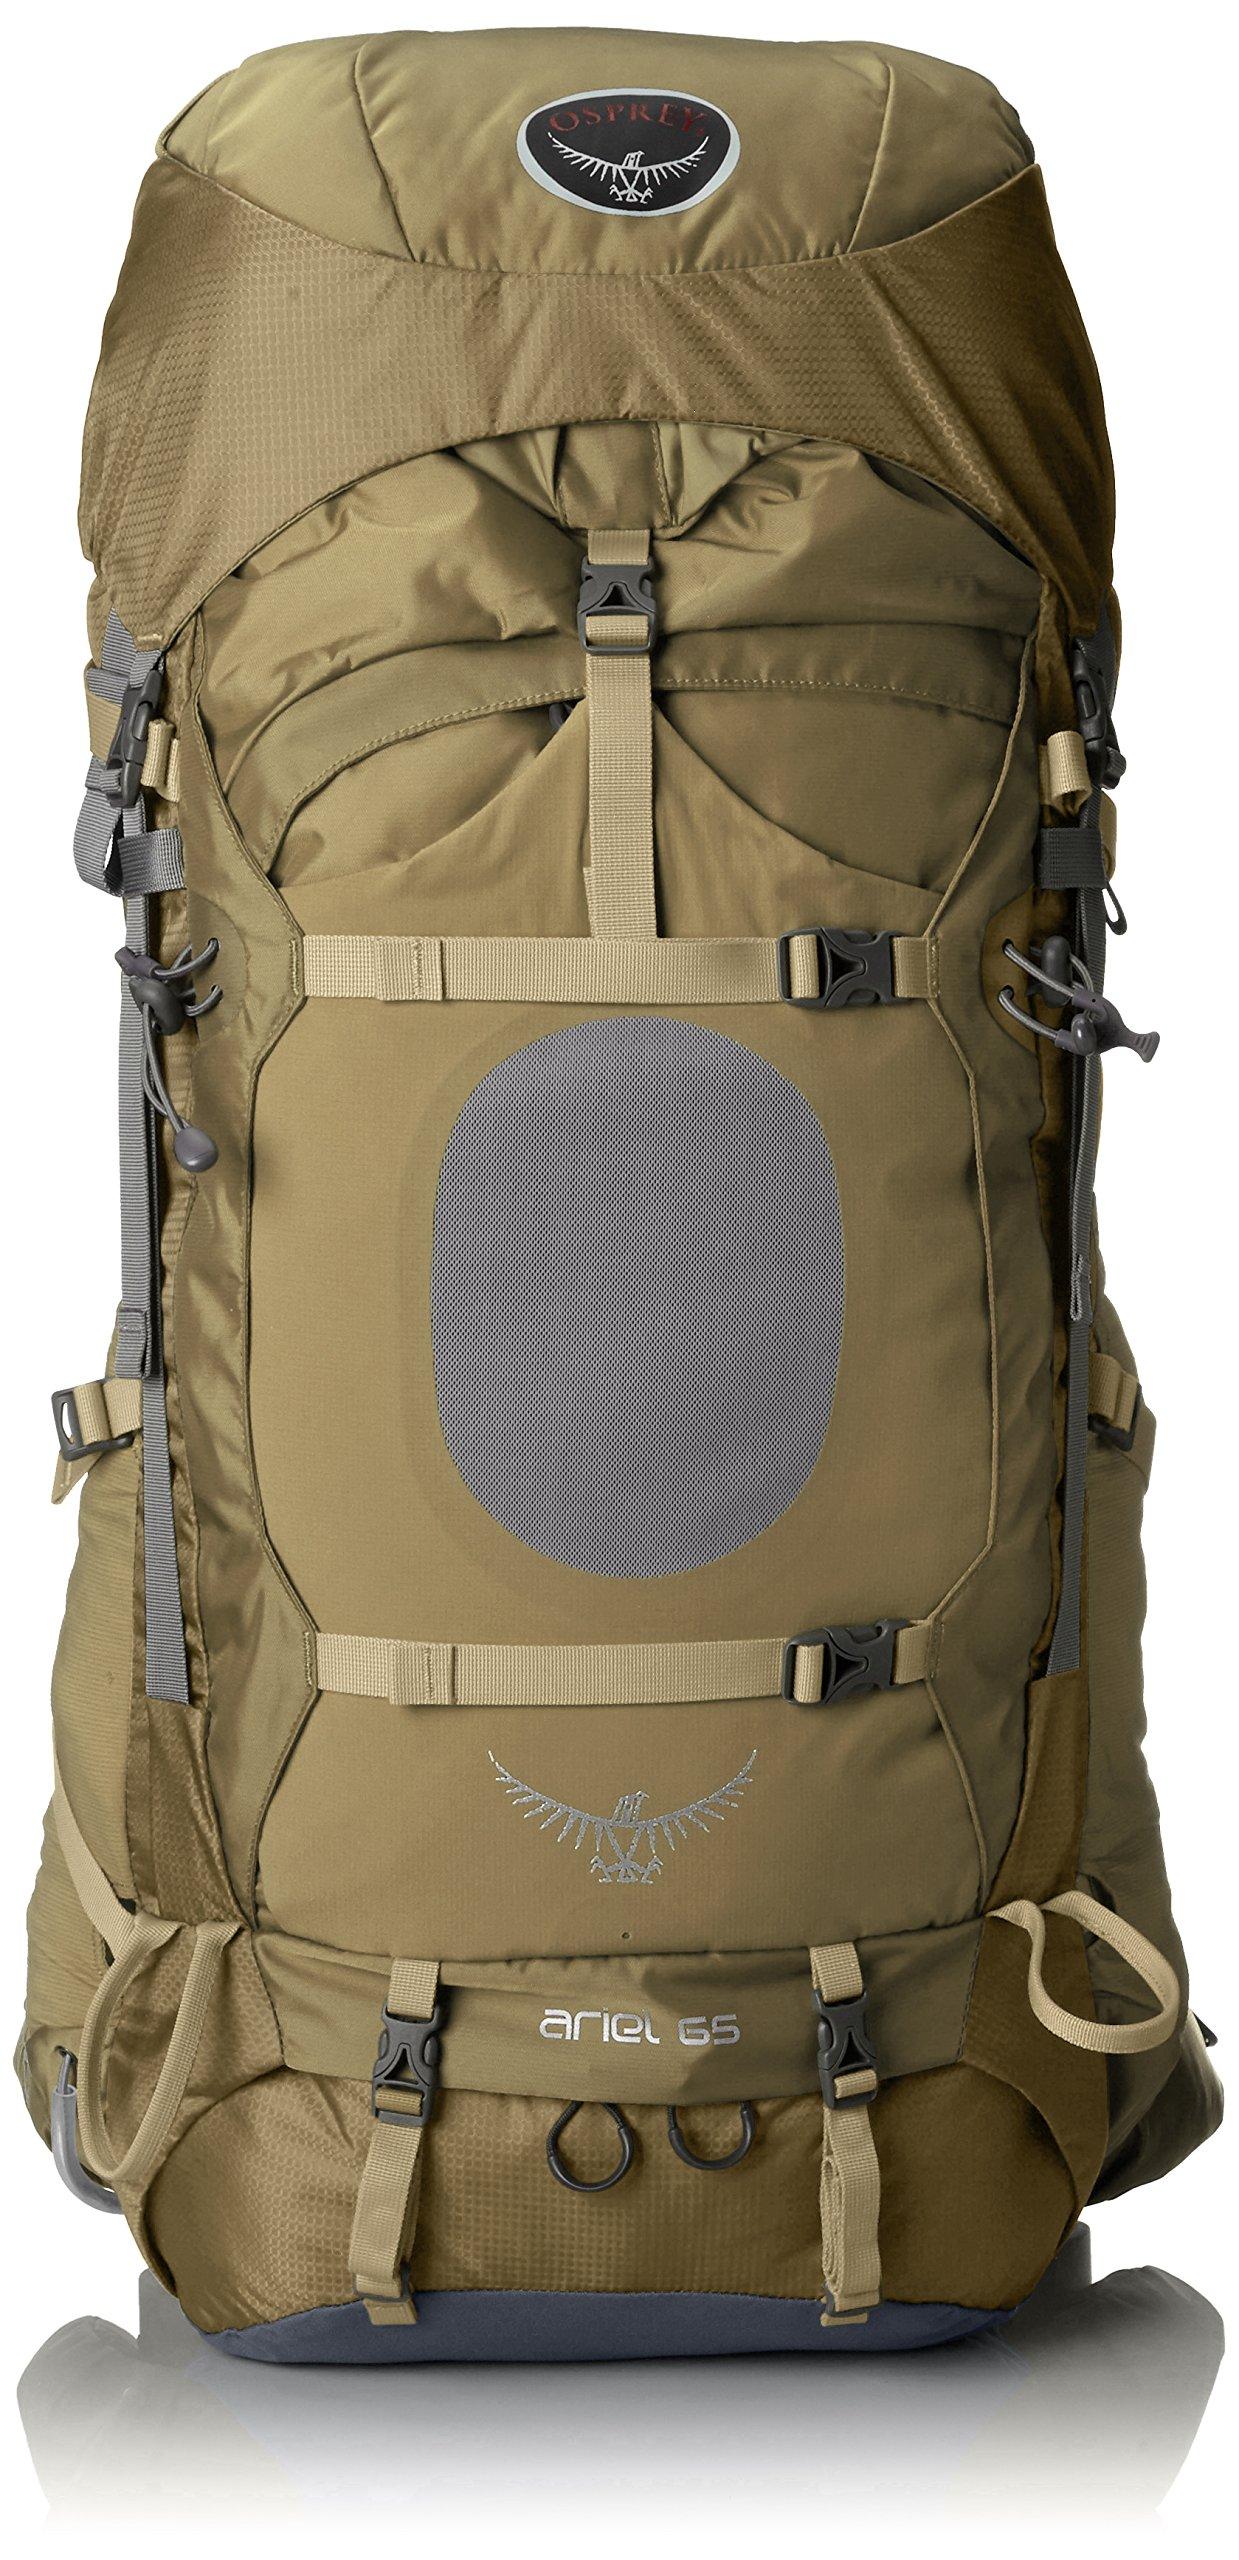 Osprey Women's Ariel 65 Backpack, Summer Wheat Brown, X-Small